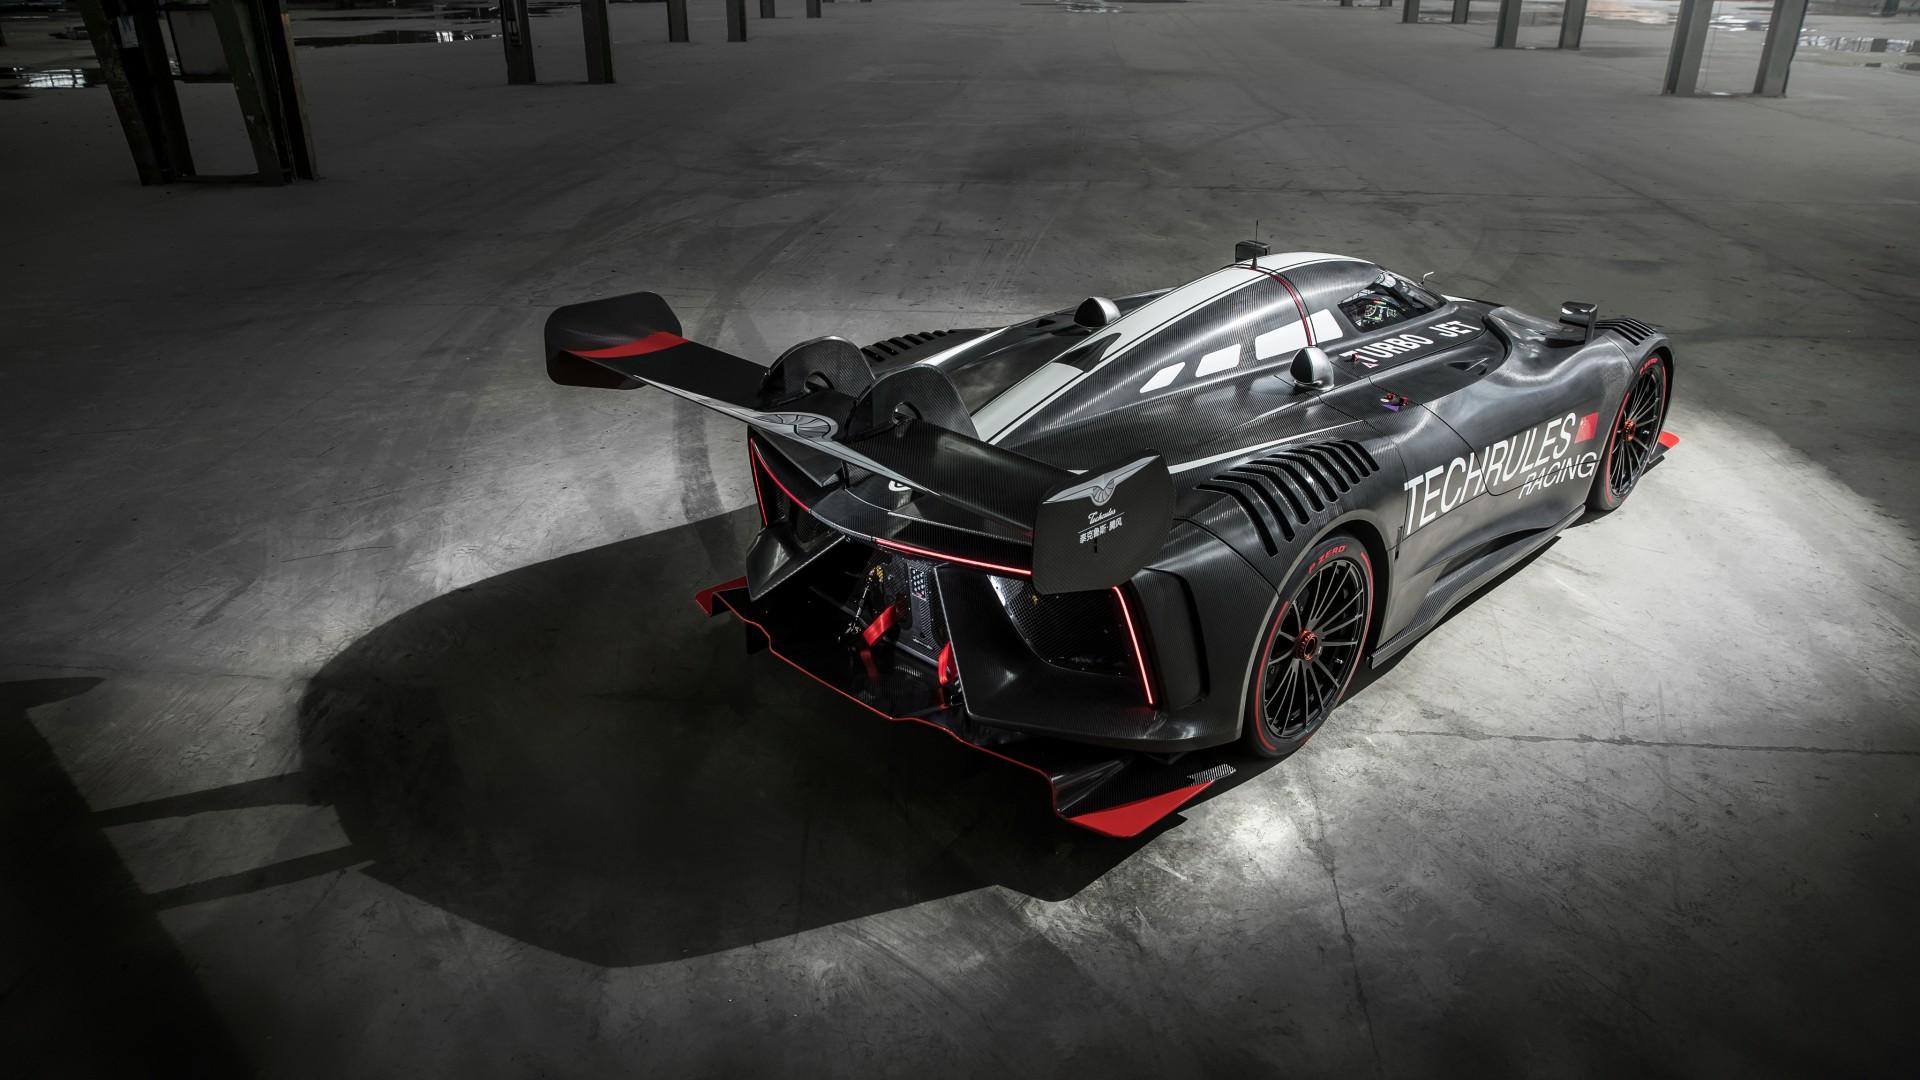 2018 Techrules Ren RS 4K 3 Wallpaper | HD Car Wallpapers ...